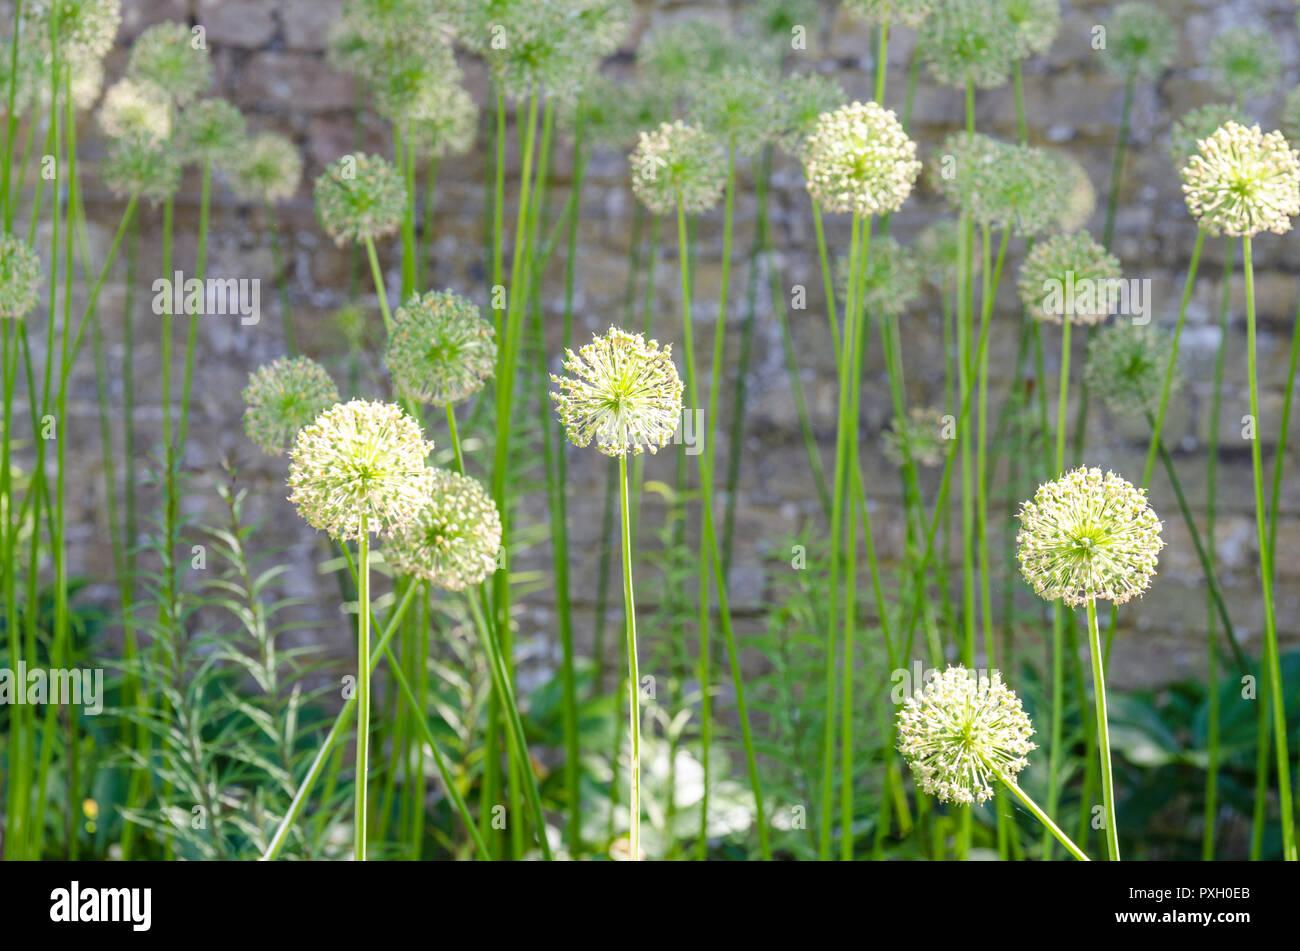 Allieae, allium seed heads, allium seed head, allium seedhead, ornamental onions, monocotyledonous Stock Photo